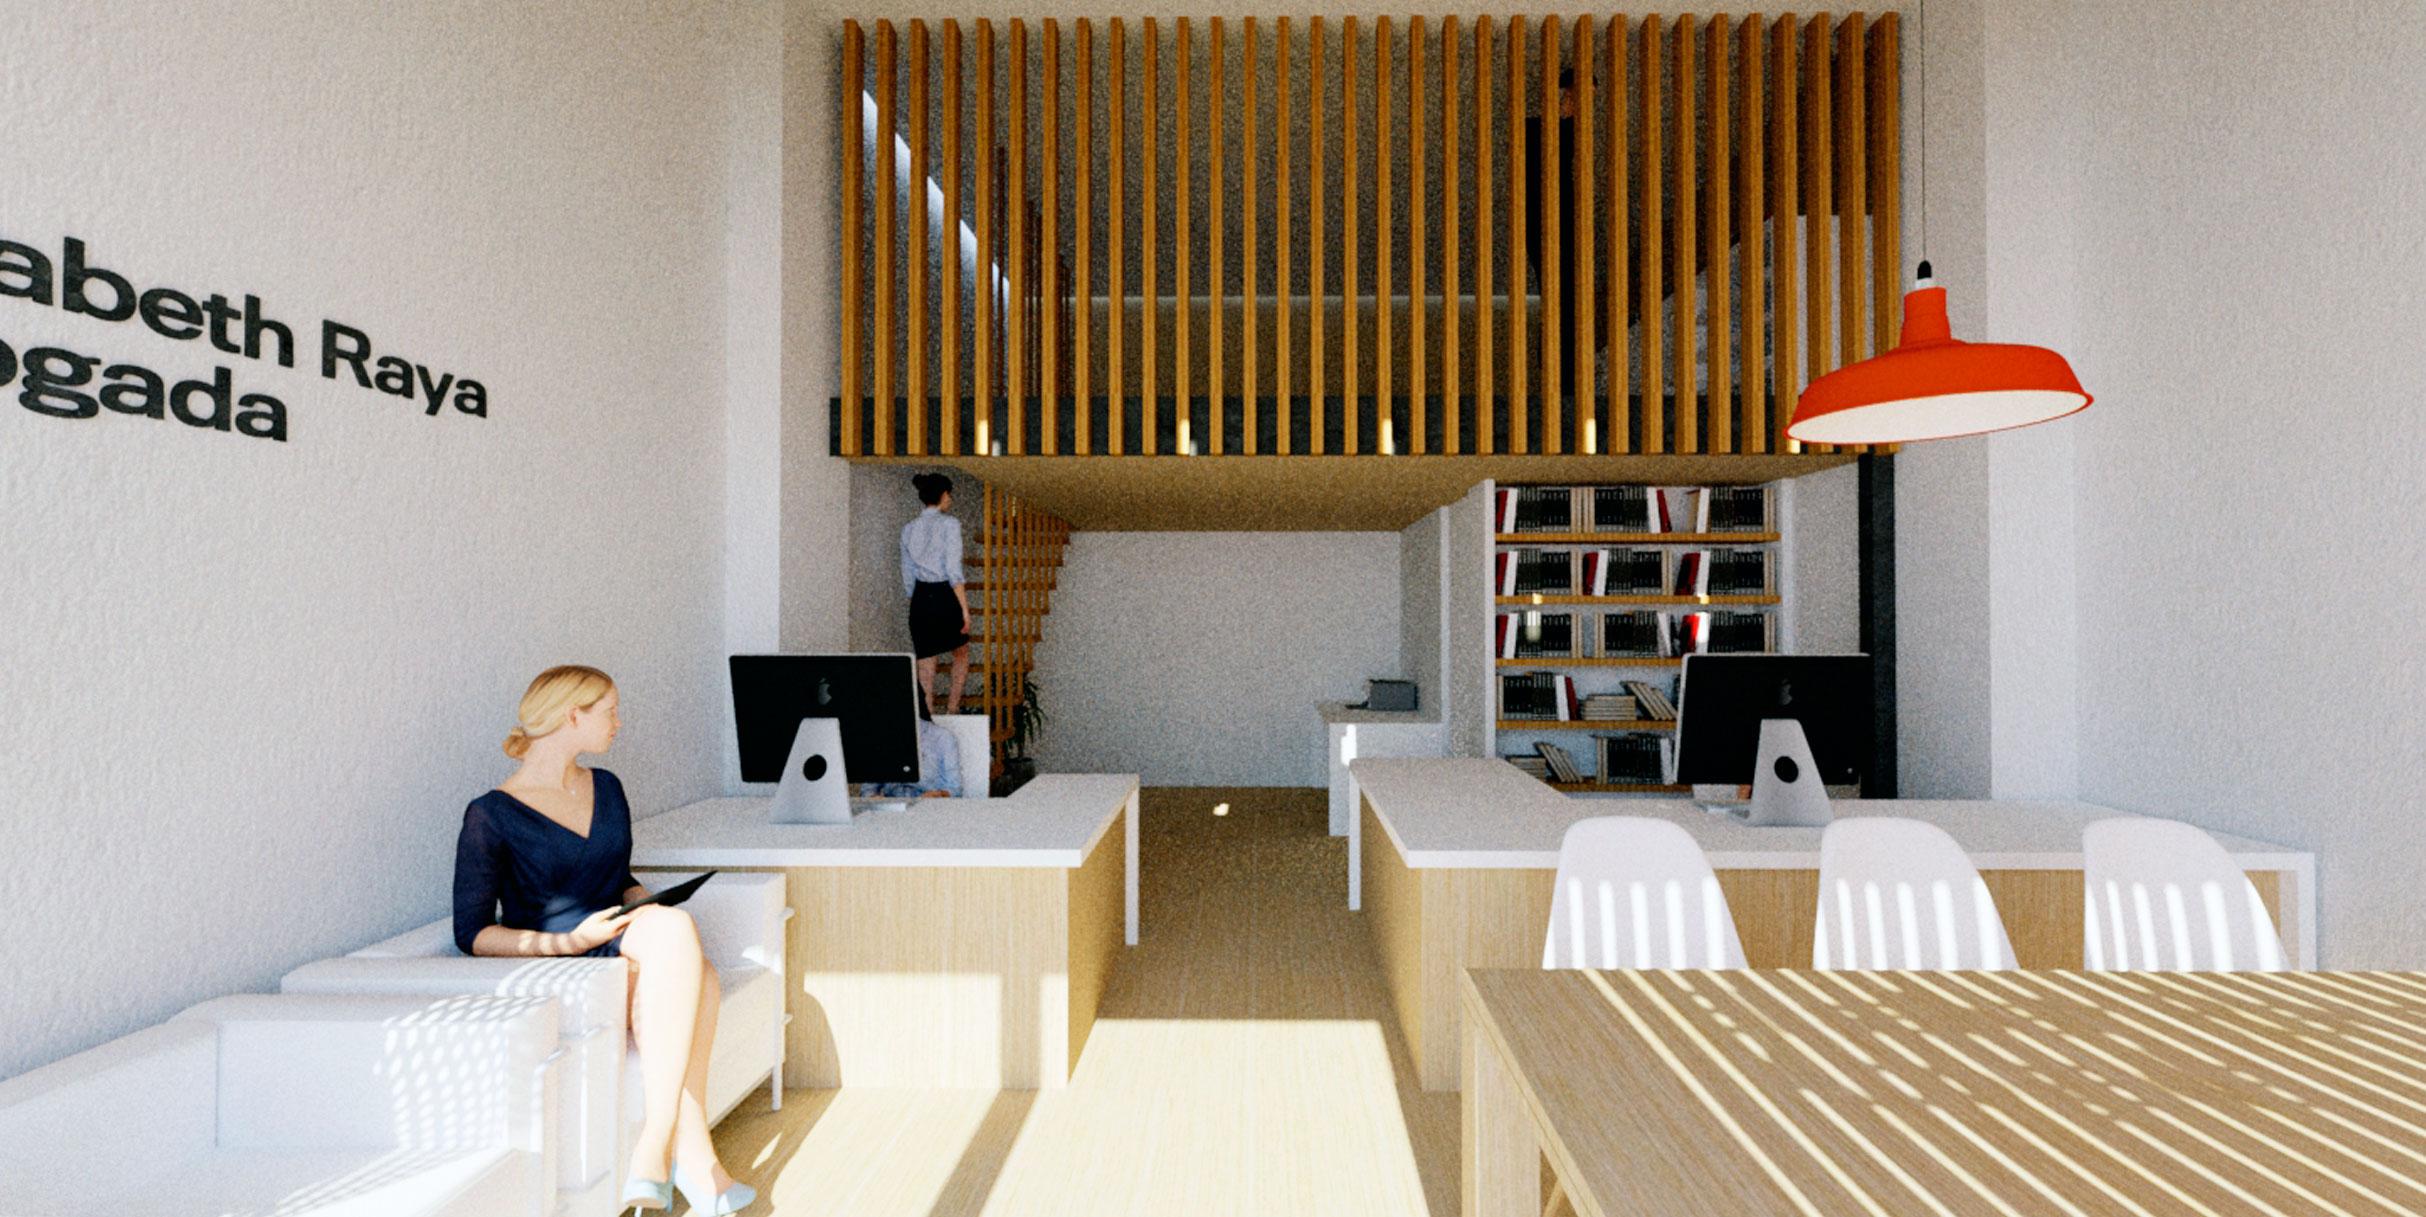 Jaime salv arquitectura interiorismo j542 despacho - Despacho arquitectura barcelona ...